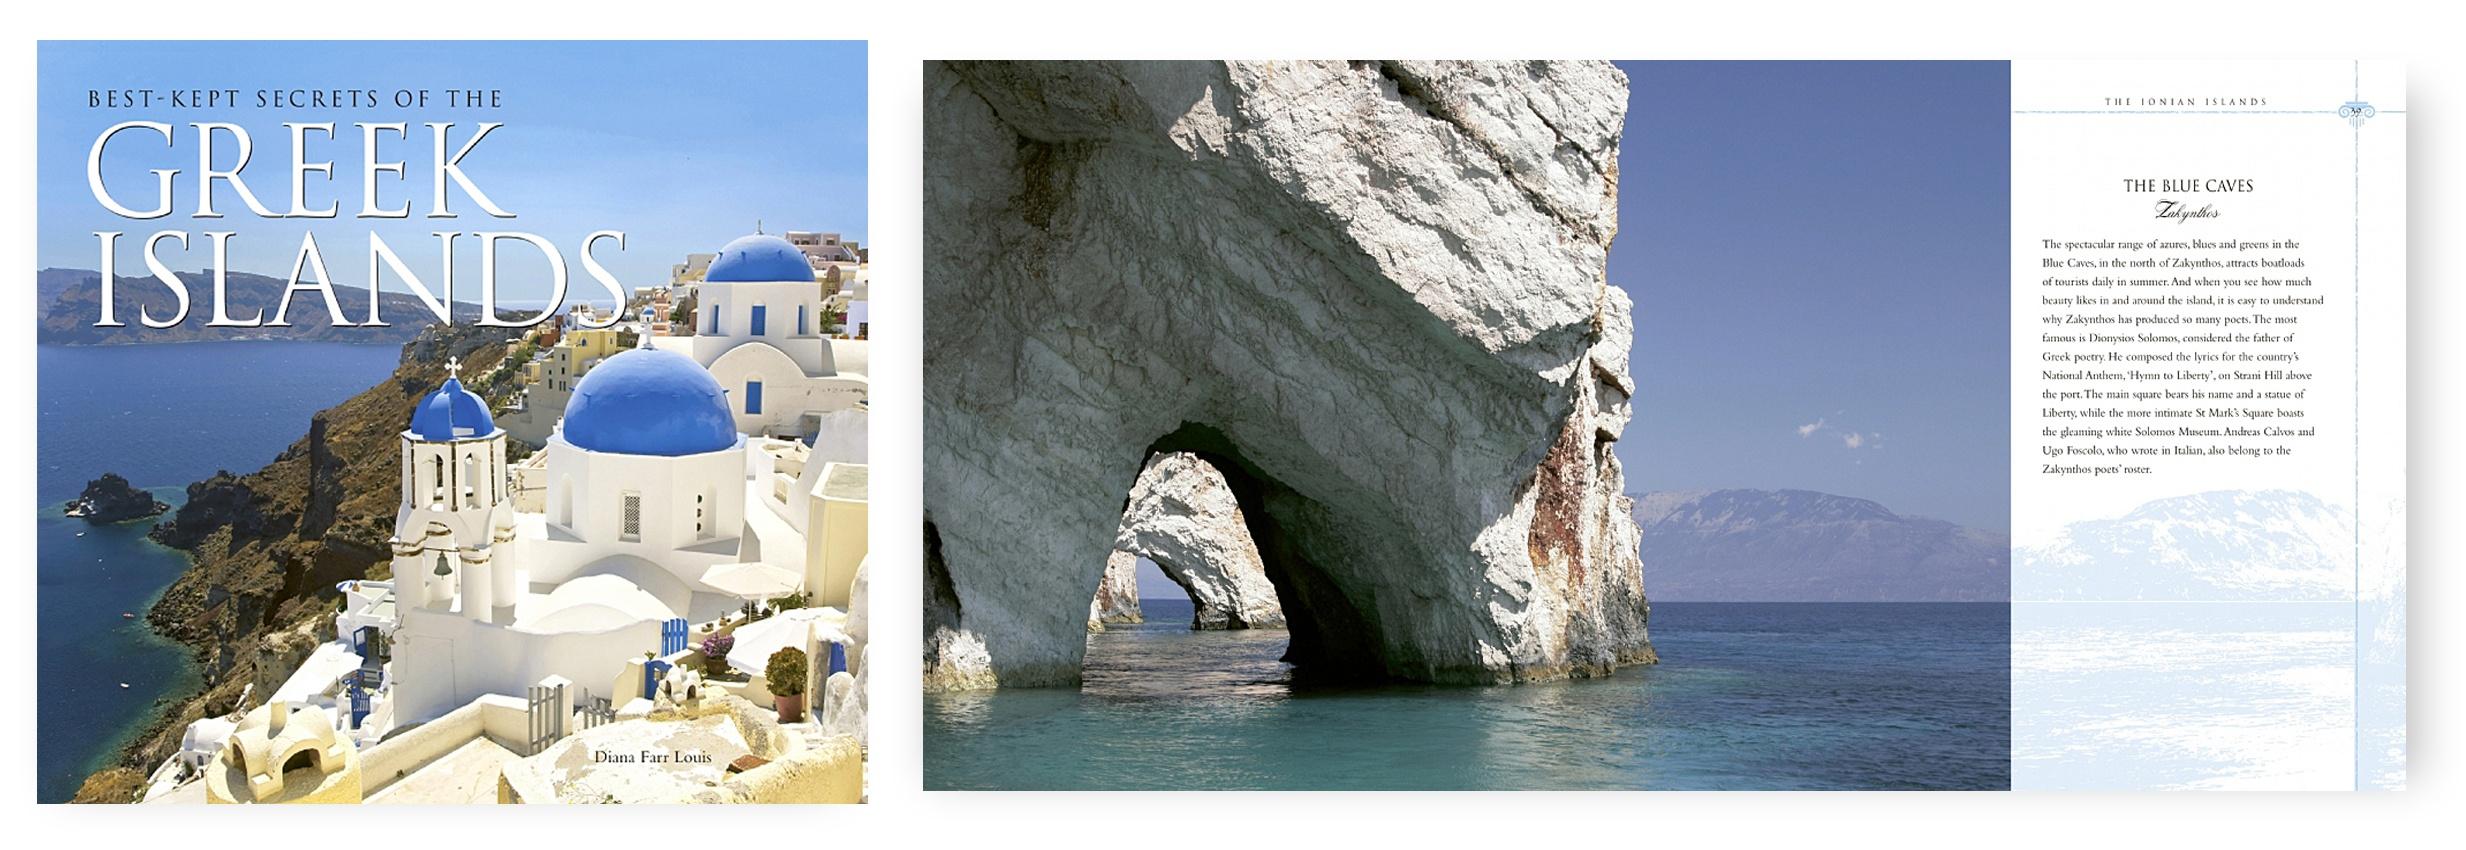 greek islands w- Spread